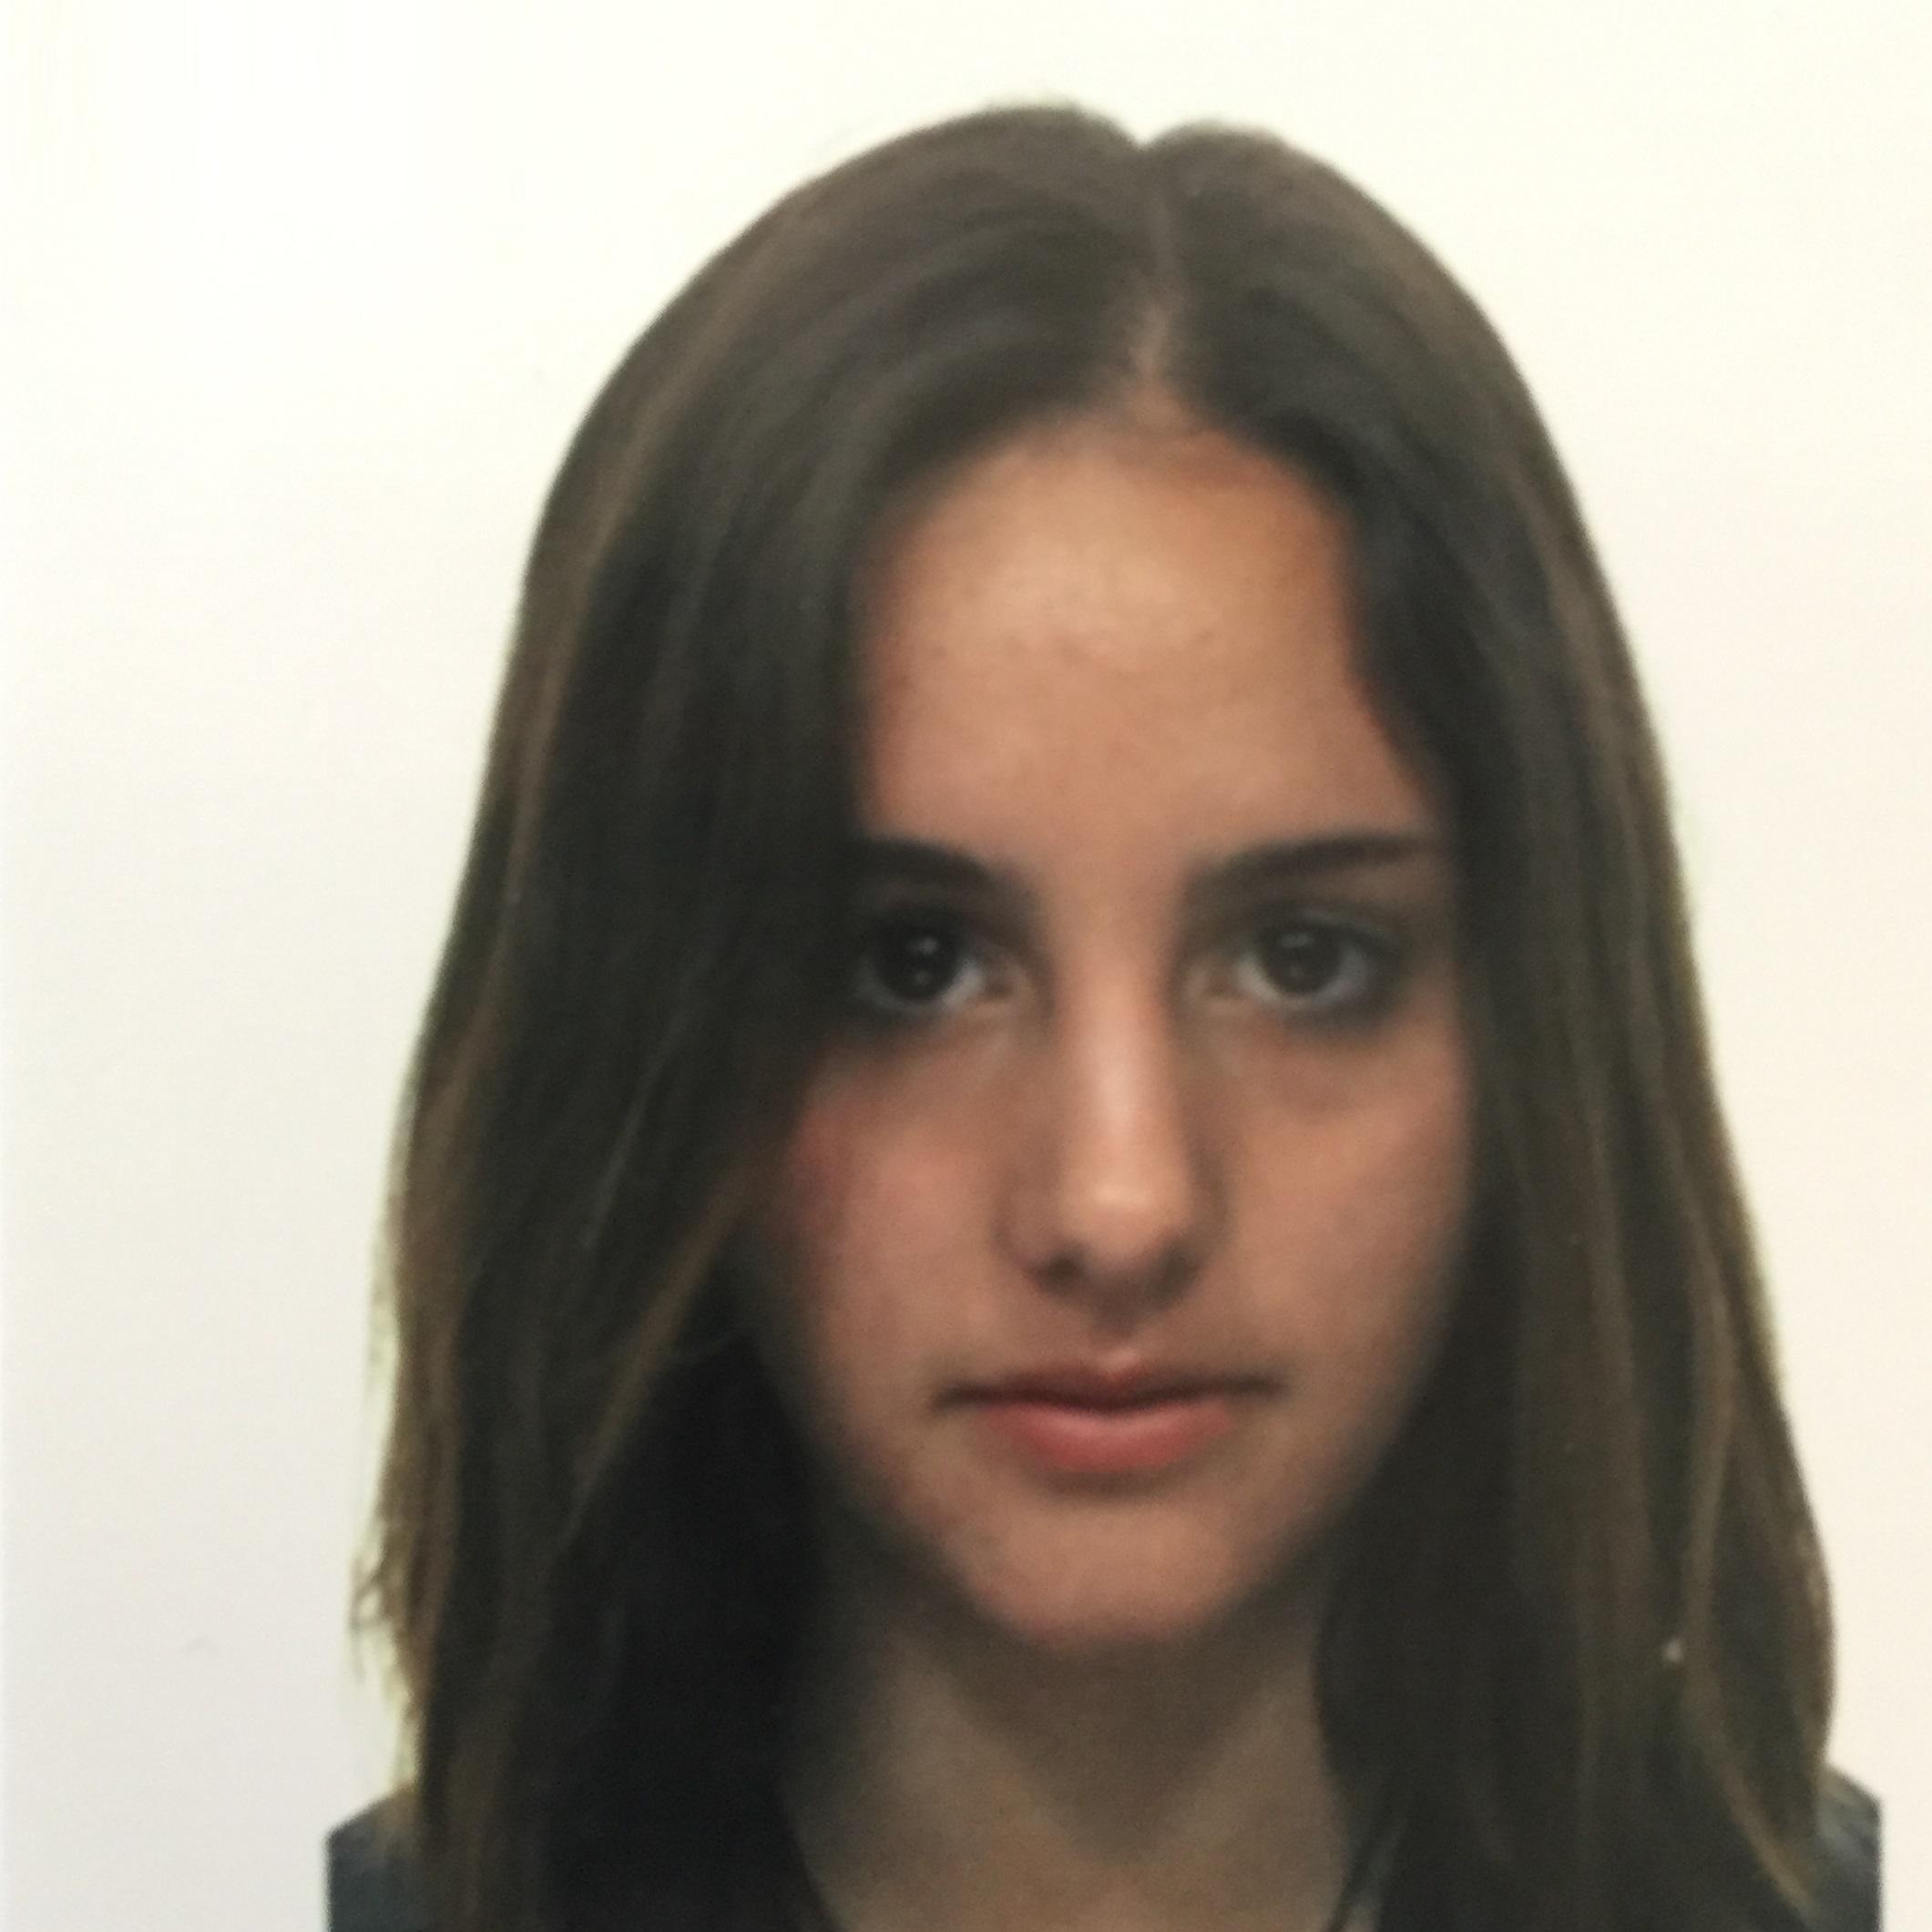 Chiara Maria Jacazzi